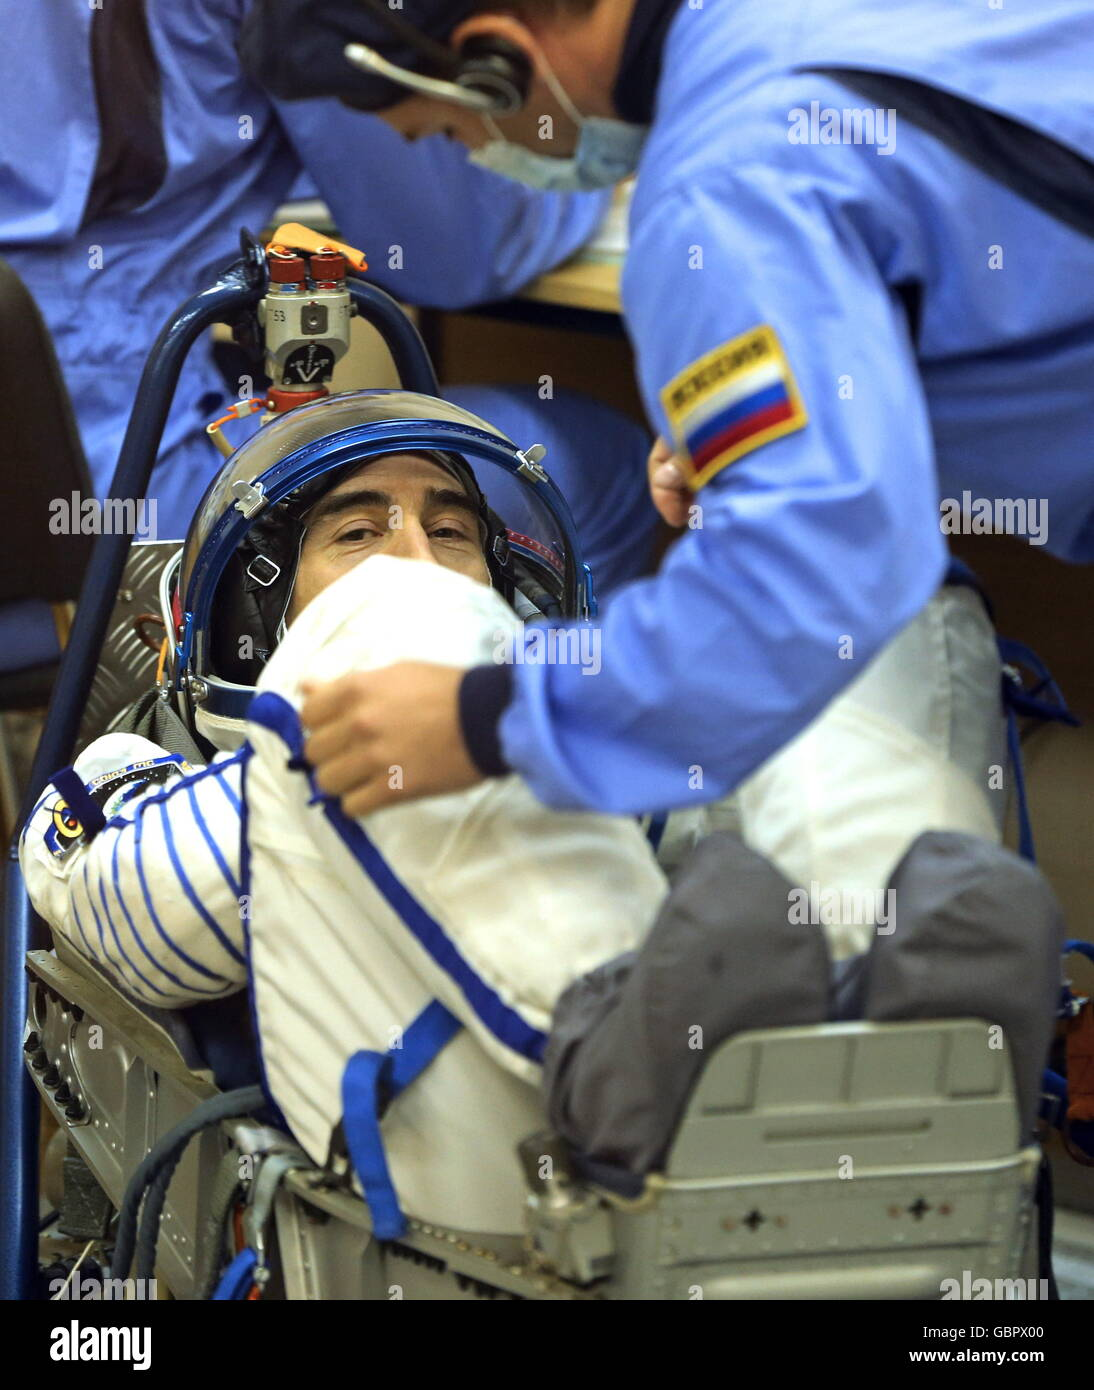 Baikonur Cosmodrome, Kazakhstan. 7th July, 2016. Russian cosmonaut Anatoly Ivanishin (Roscosmos), a member of the - Stock Image